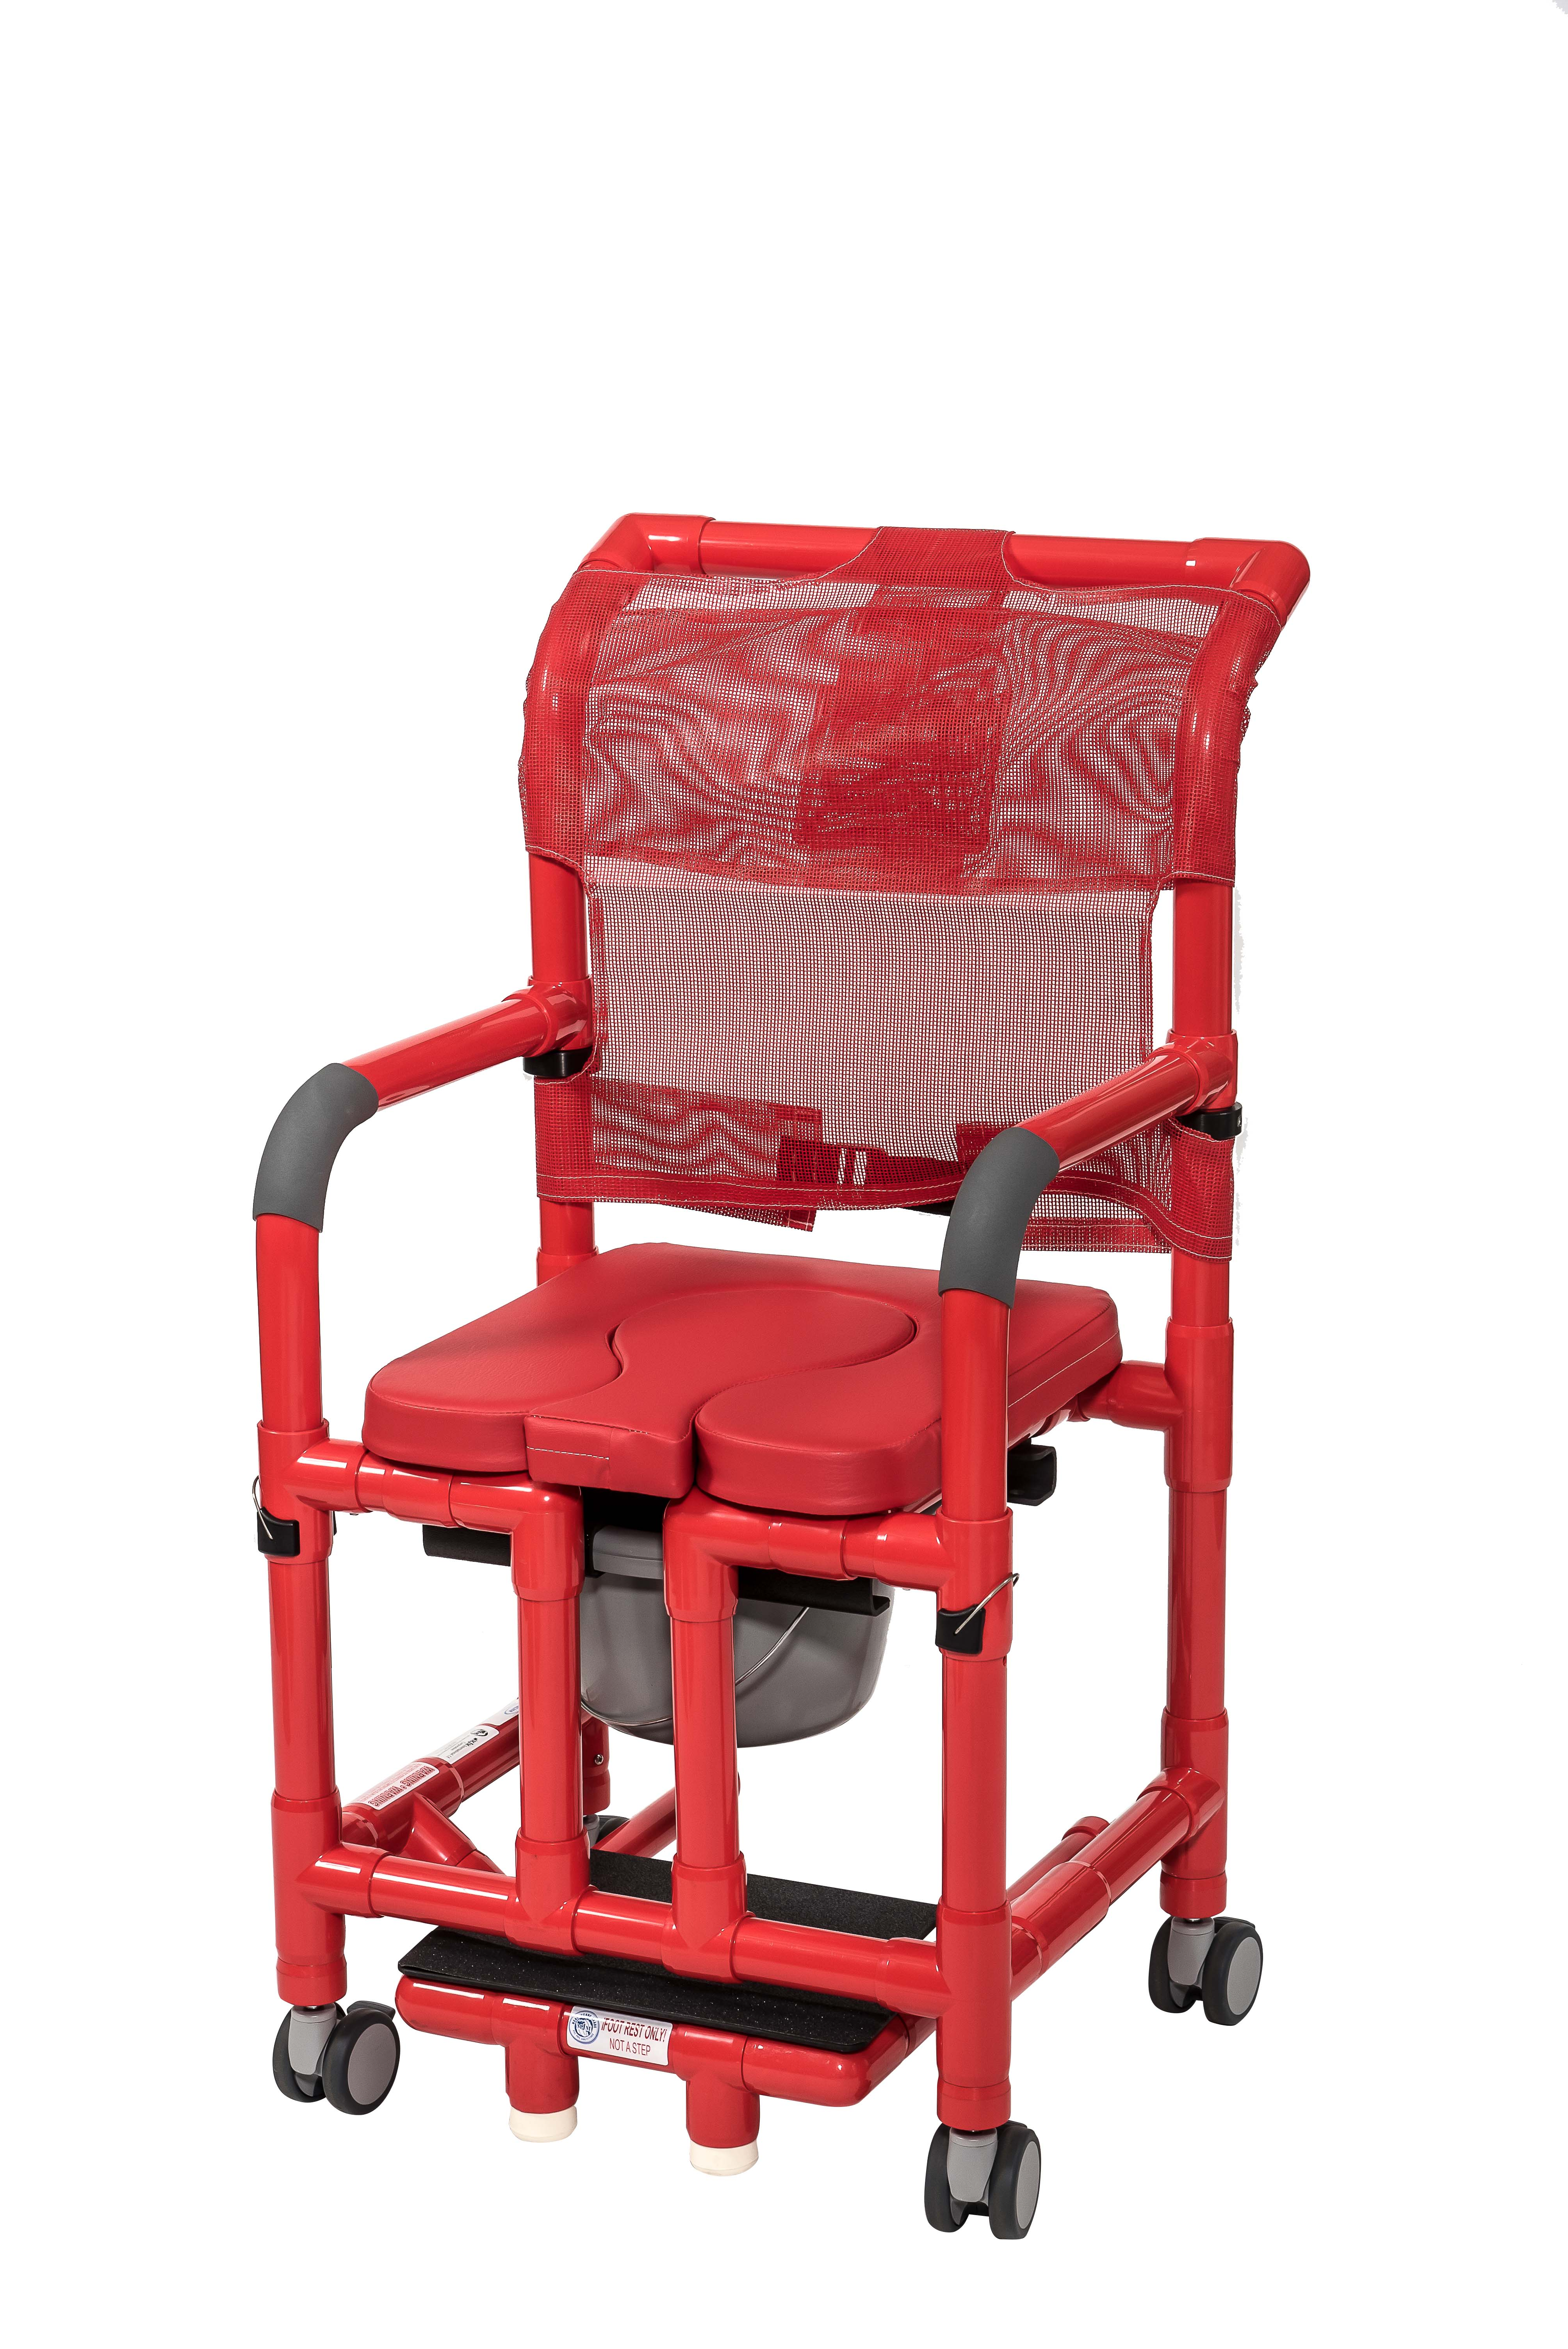 careline pflegeshop pcs komplett farbe rot online kaufen. Black Bedroom Furniture Sets. Home Design Ideas